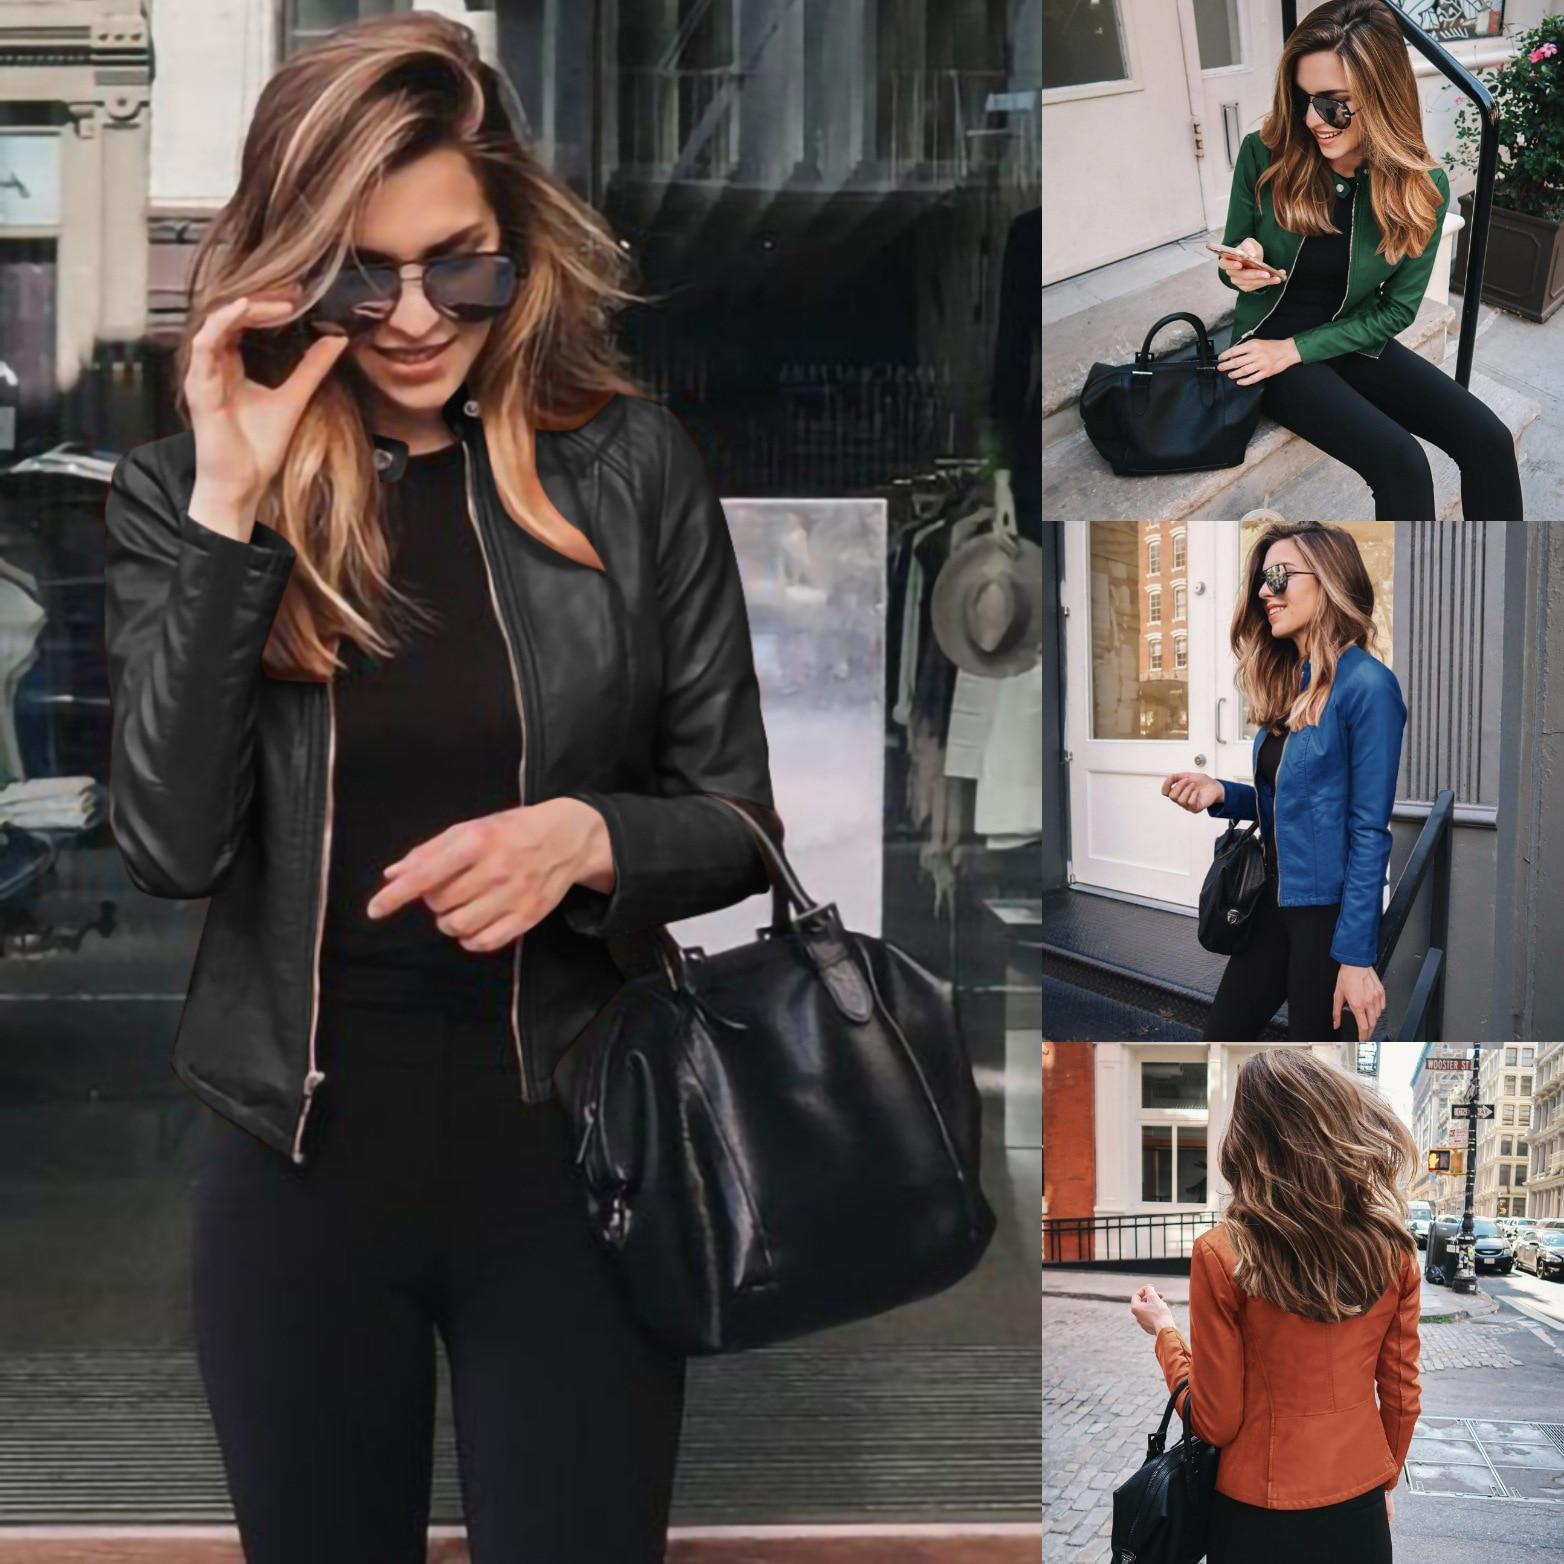 H6cc9cd935df742f7b835ea06549f9bceG 2021 Women Winter Coat Jacket Thicken Fashion Long sleeve Outwear PU Leather Jacket warm Coats For Women Autumn Women's Clothing